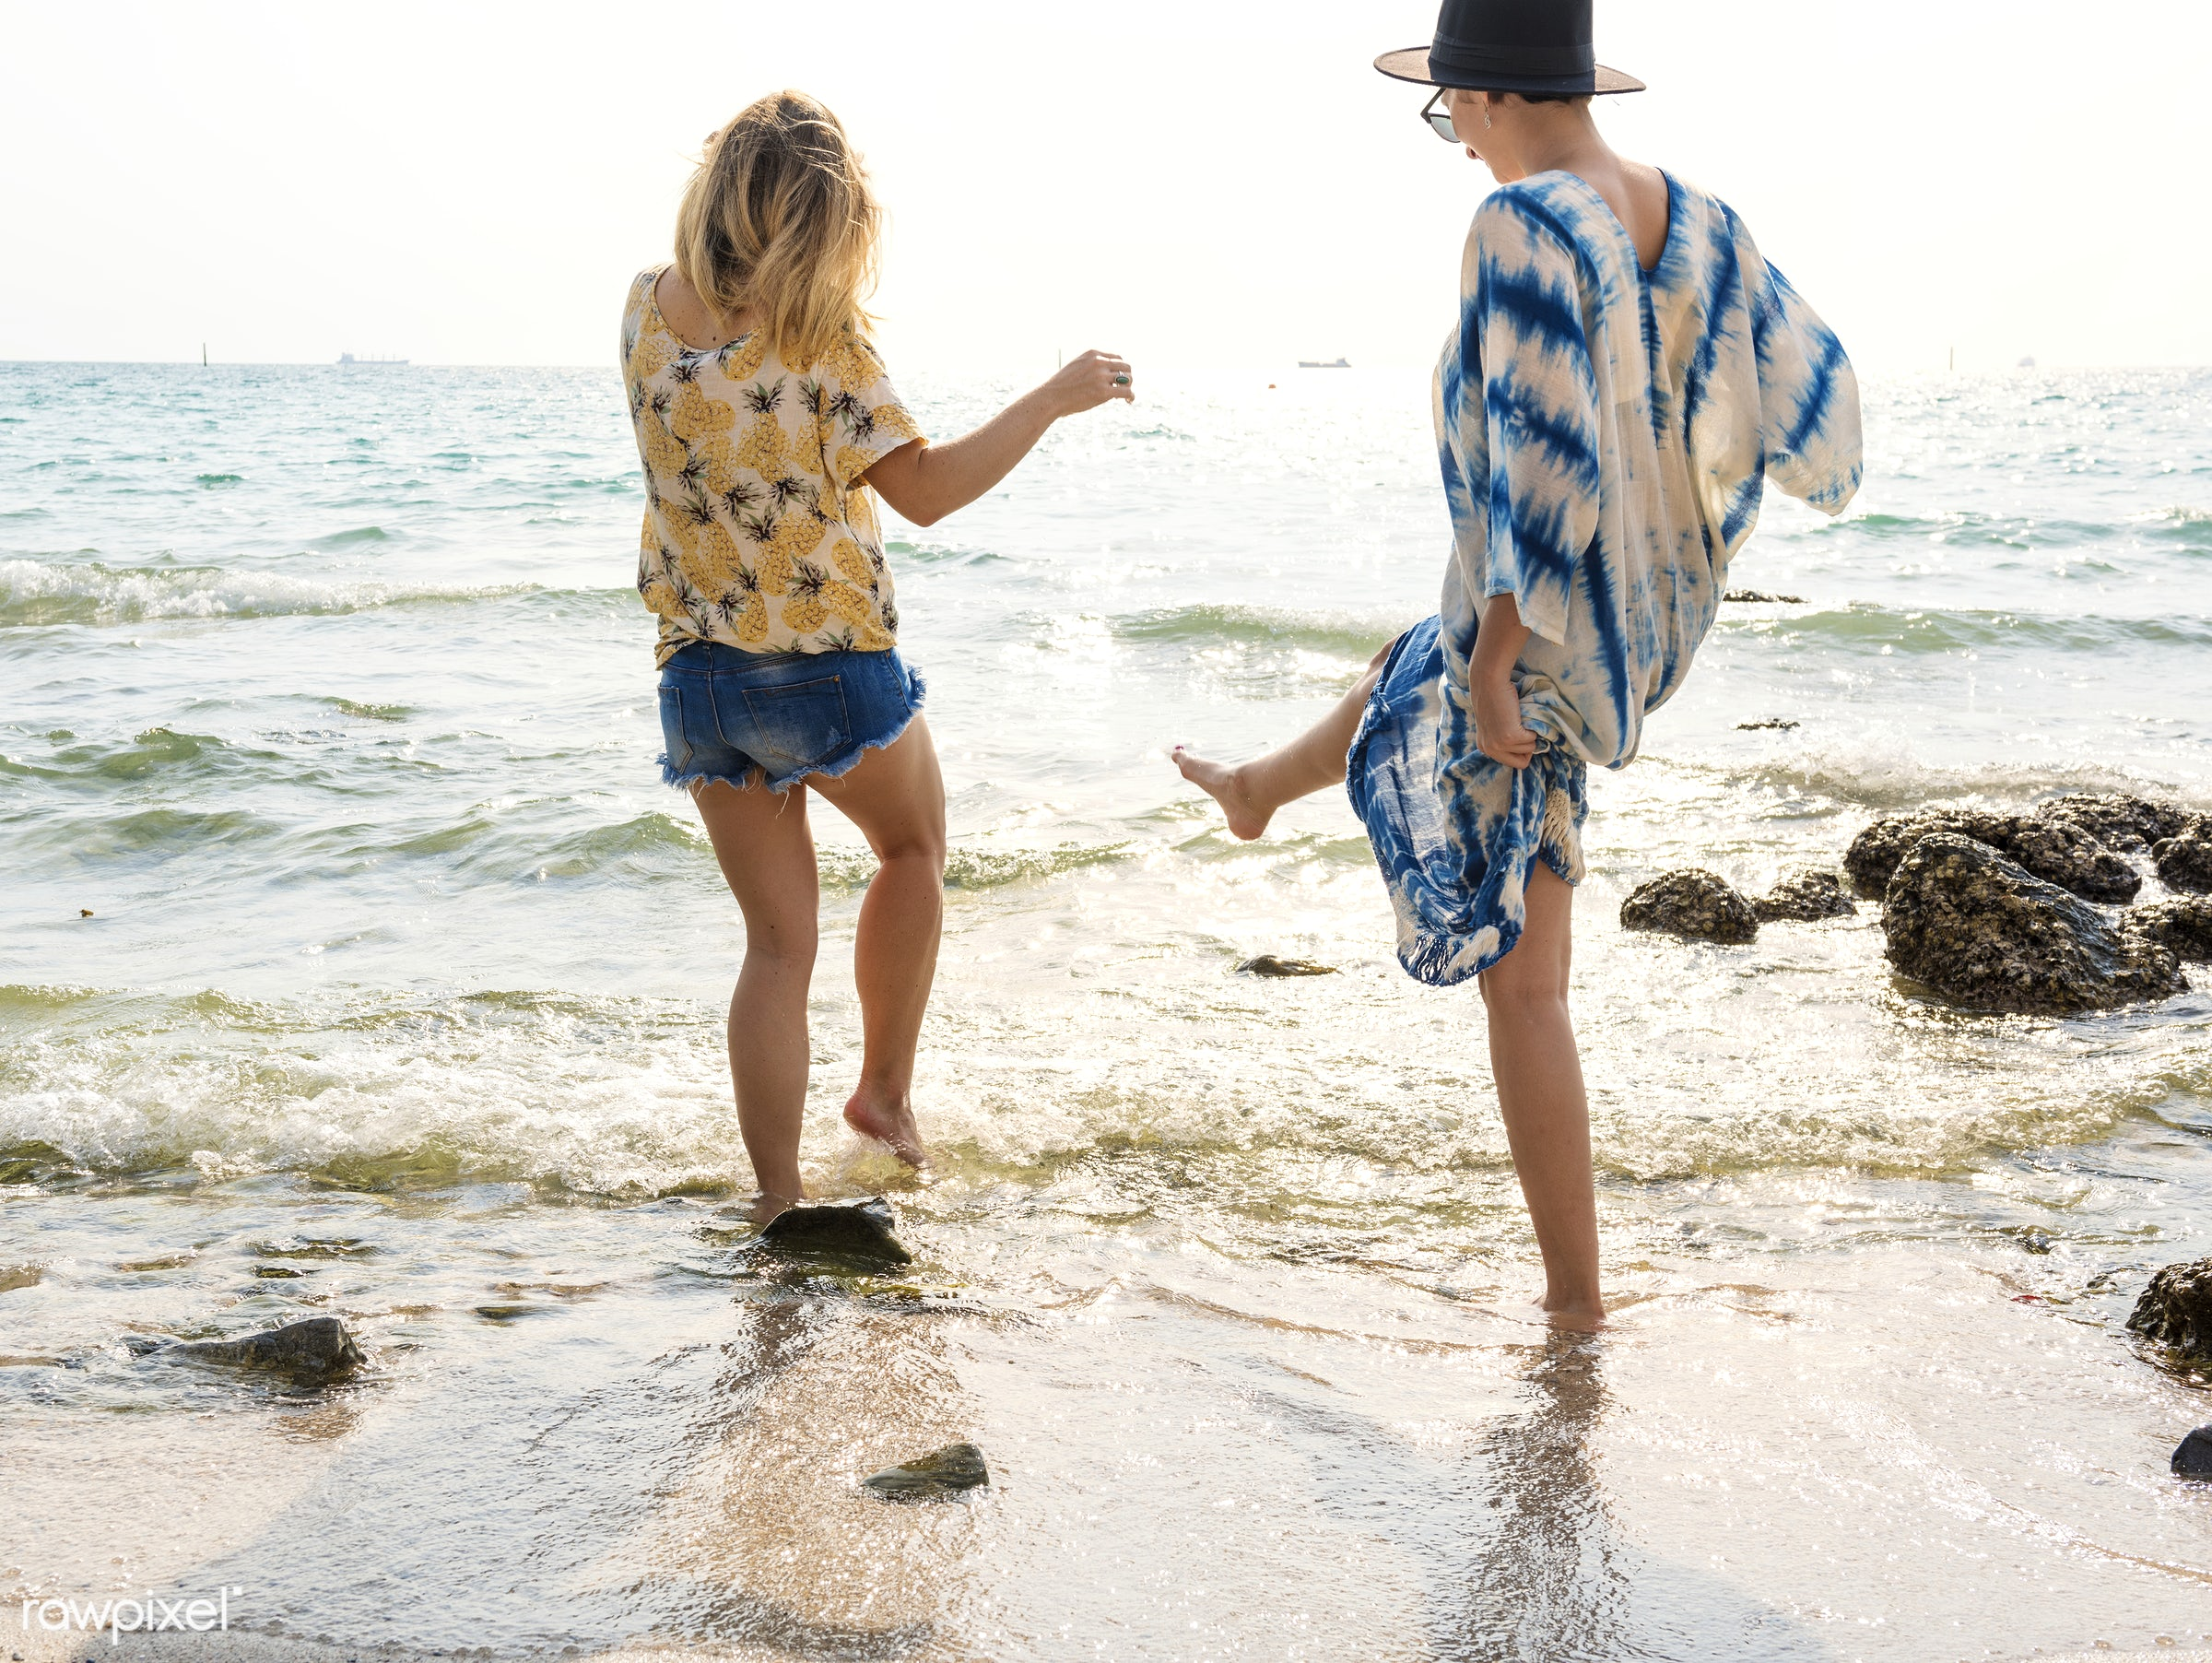 calm, freedom, location, beach, transportation, travel, exploration, travel destination, life, serenity, wellness, casual,...